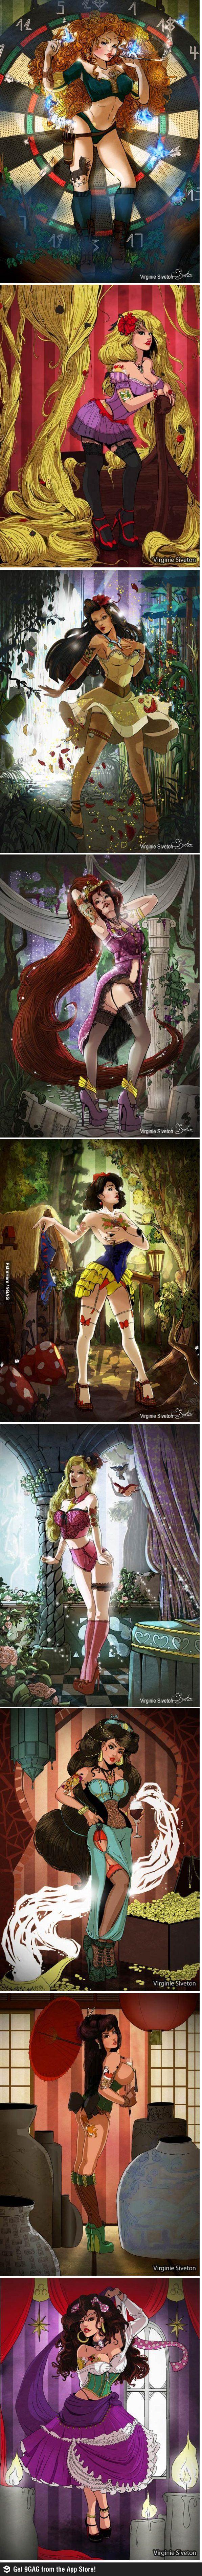 Disney pin-ups, Jasmine OMG YES